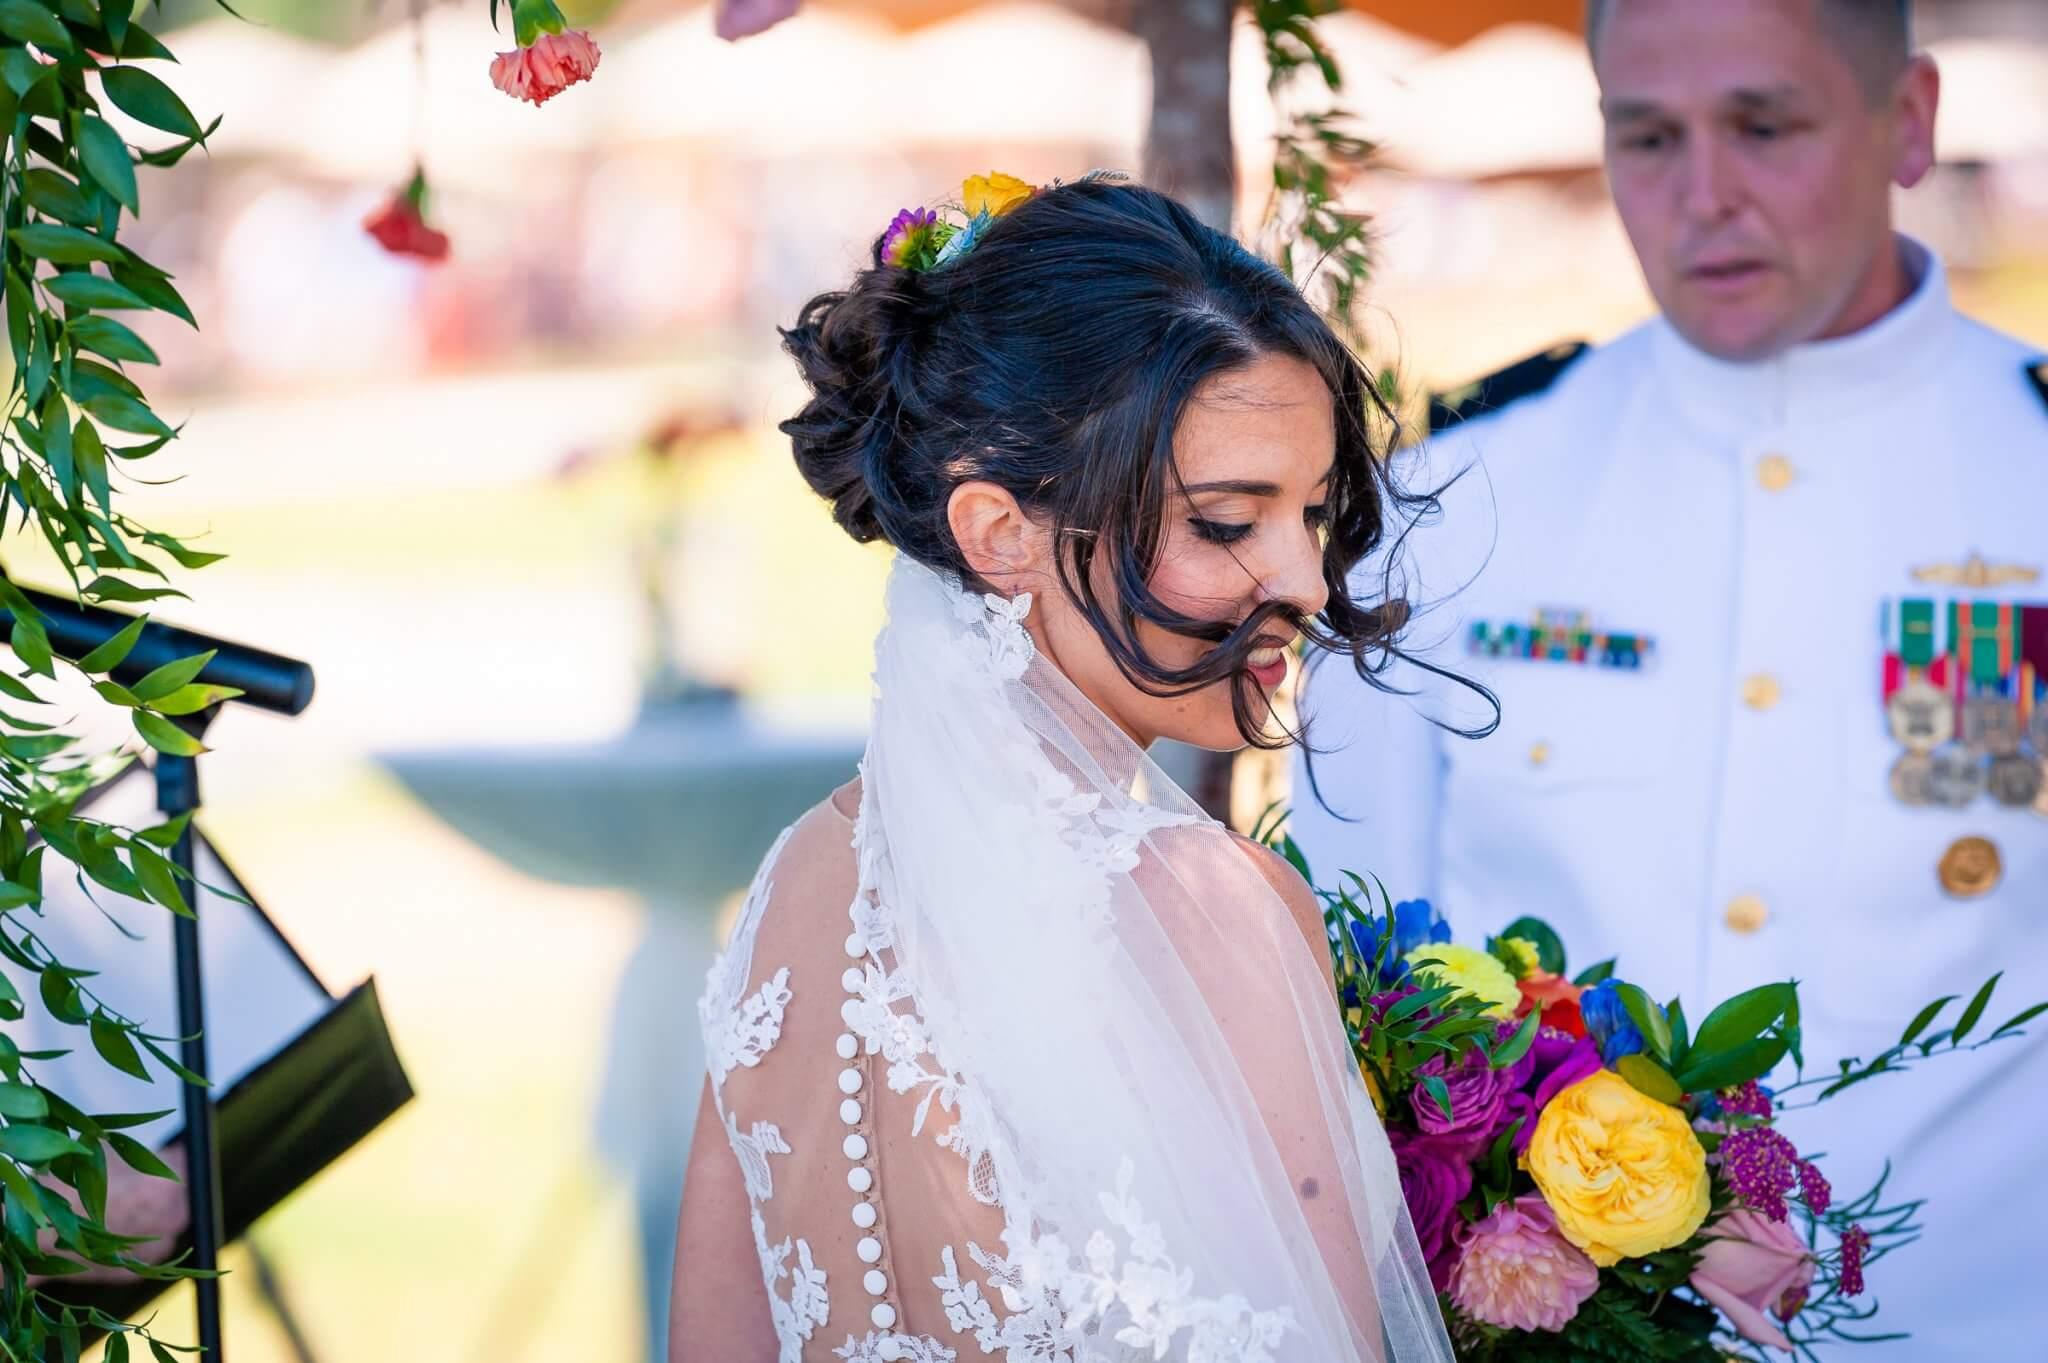 sisters-oregon-wedding-photographers-18-2048x1363.jpg